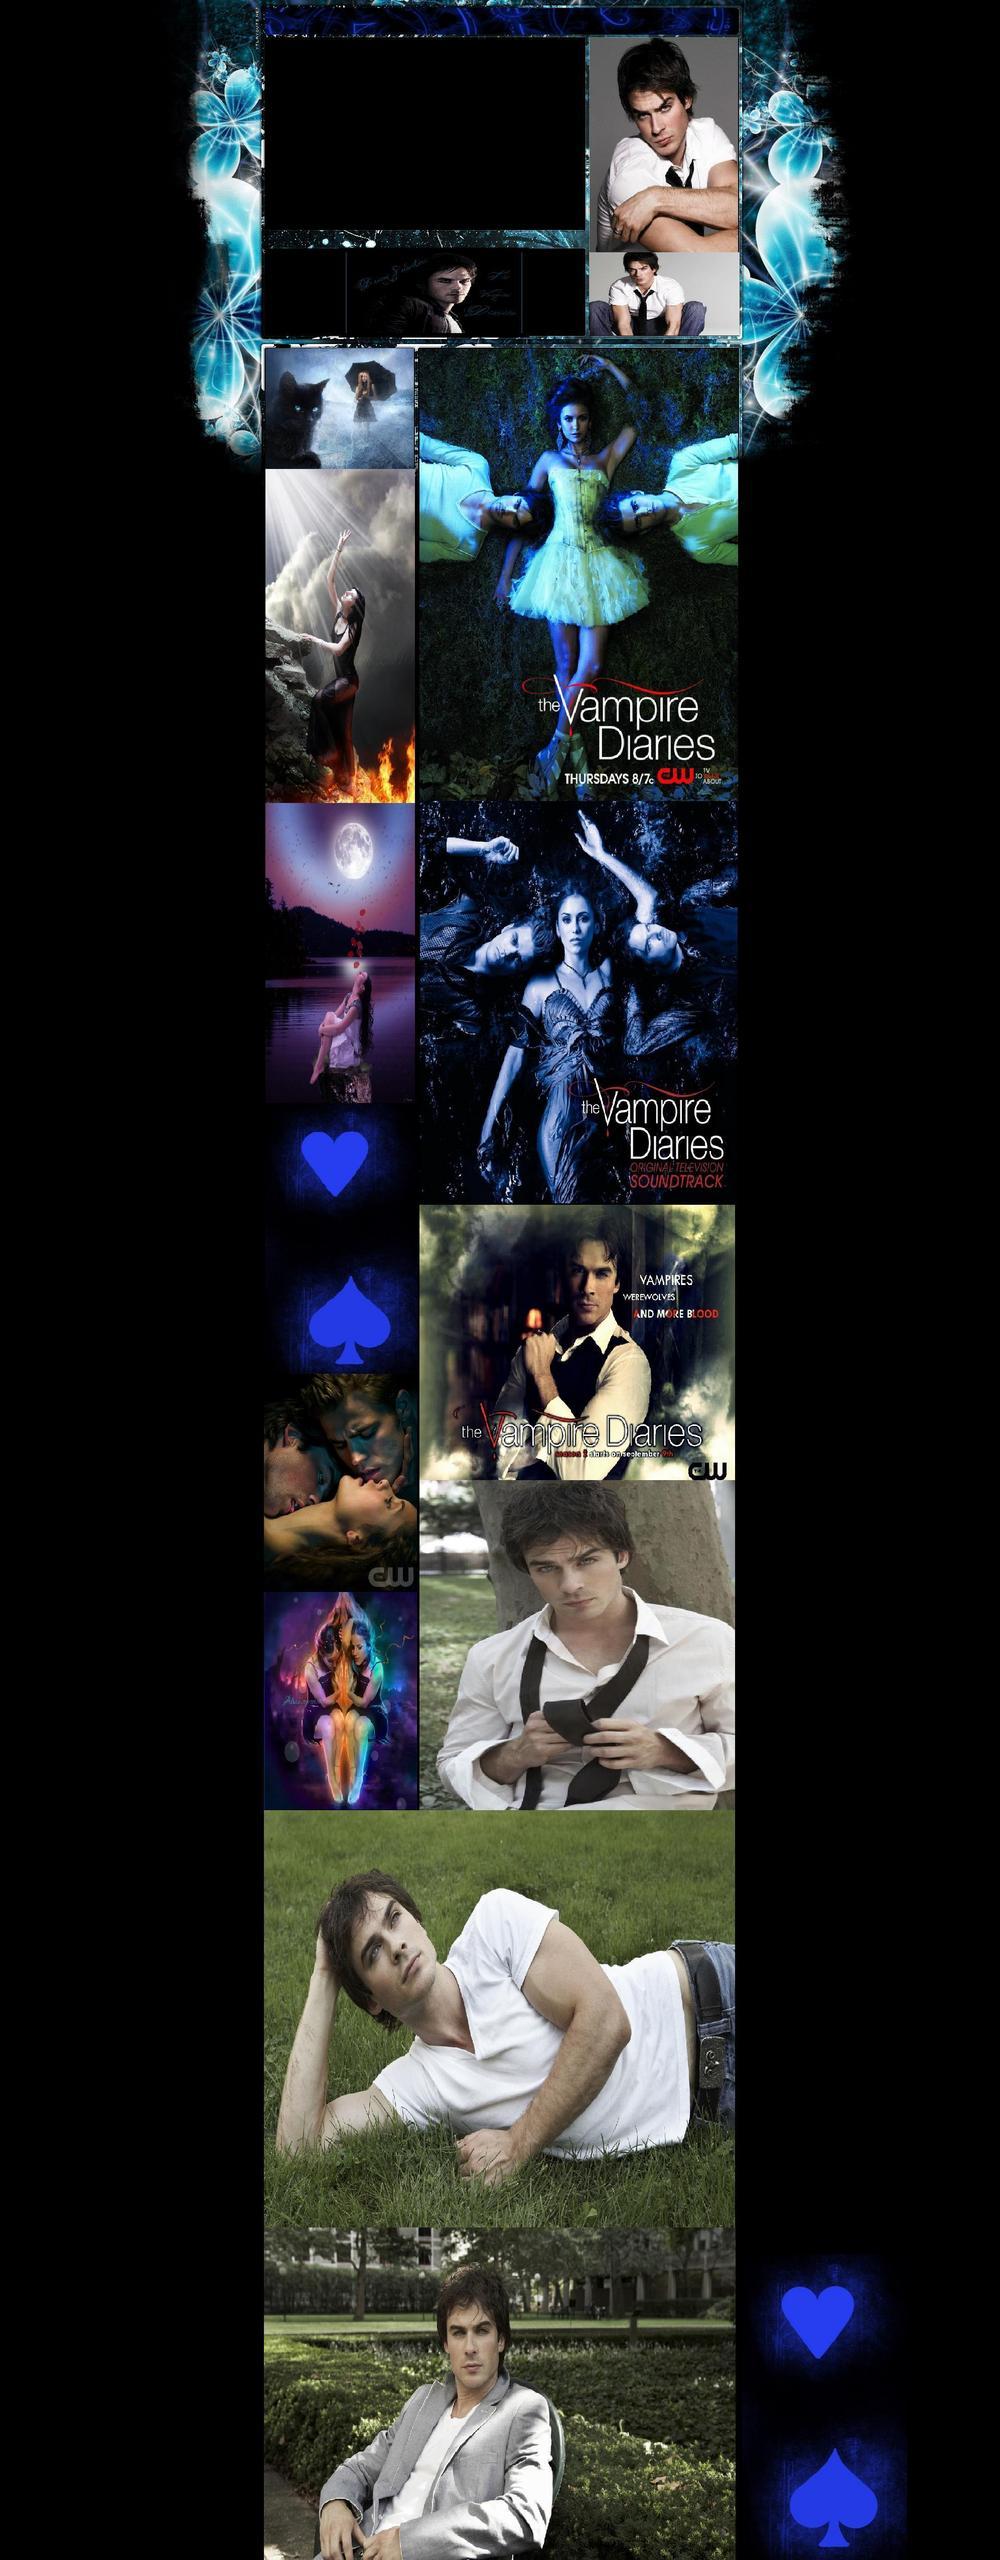 Vampire diaries यूट्यूब background